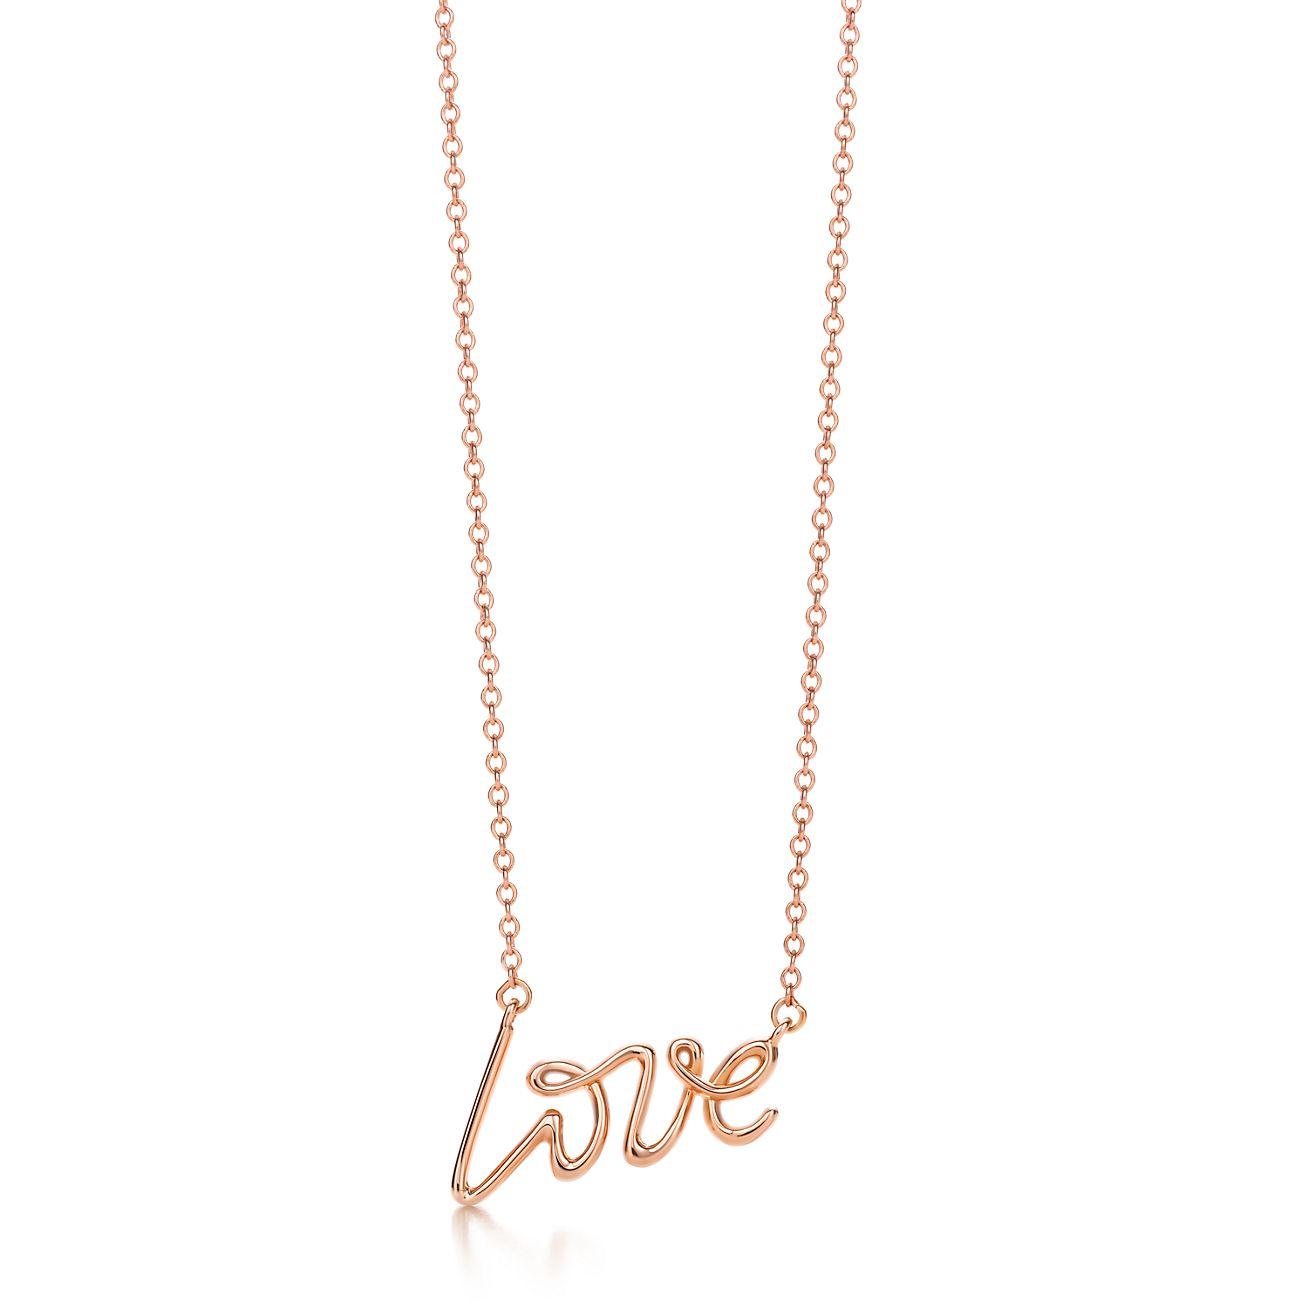 Palomas Venezia Goldoni heart pendant in 18k rose gold, small Tiffany & Co.